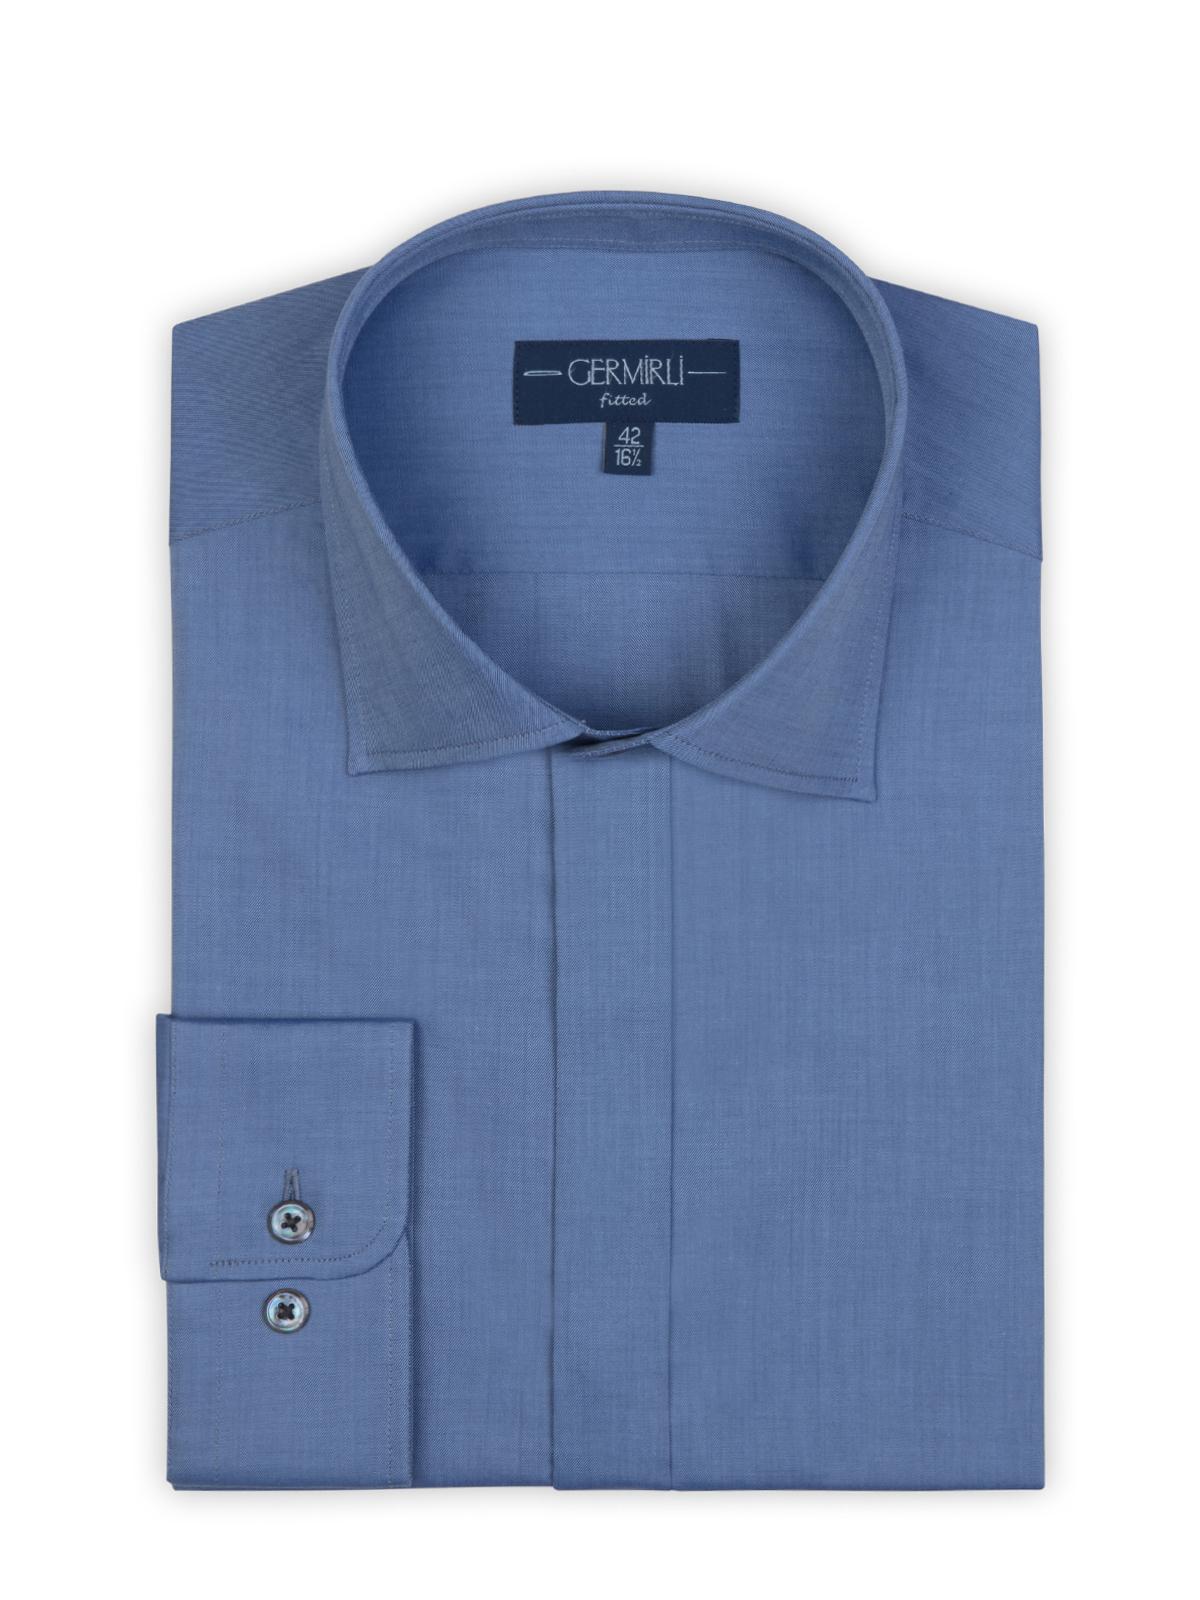 Germirli Mavi Twill Doku Gizli Pat Tailor Fit Gömlek